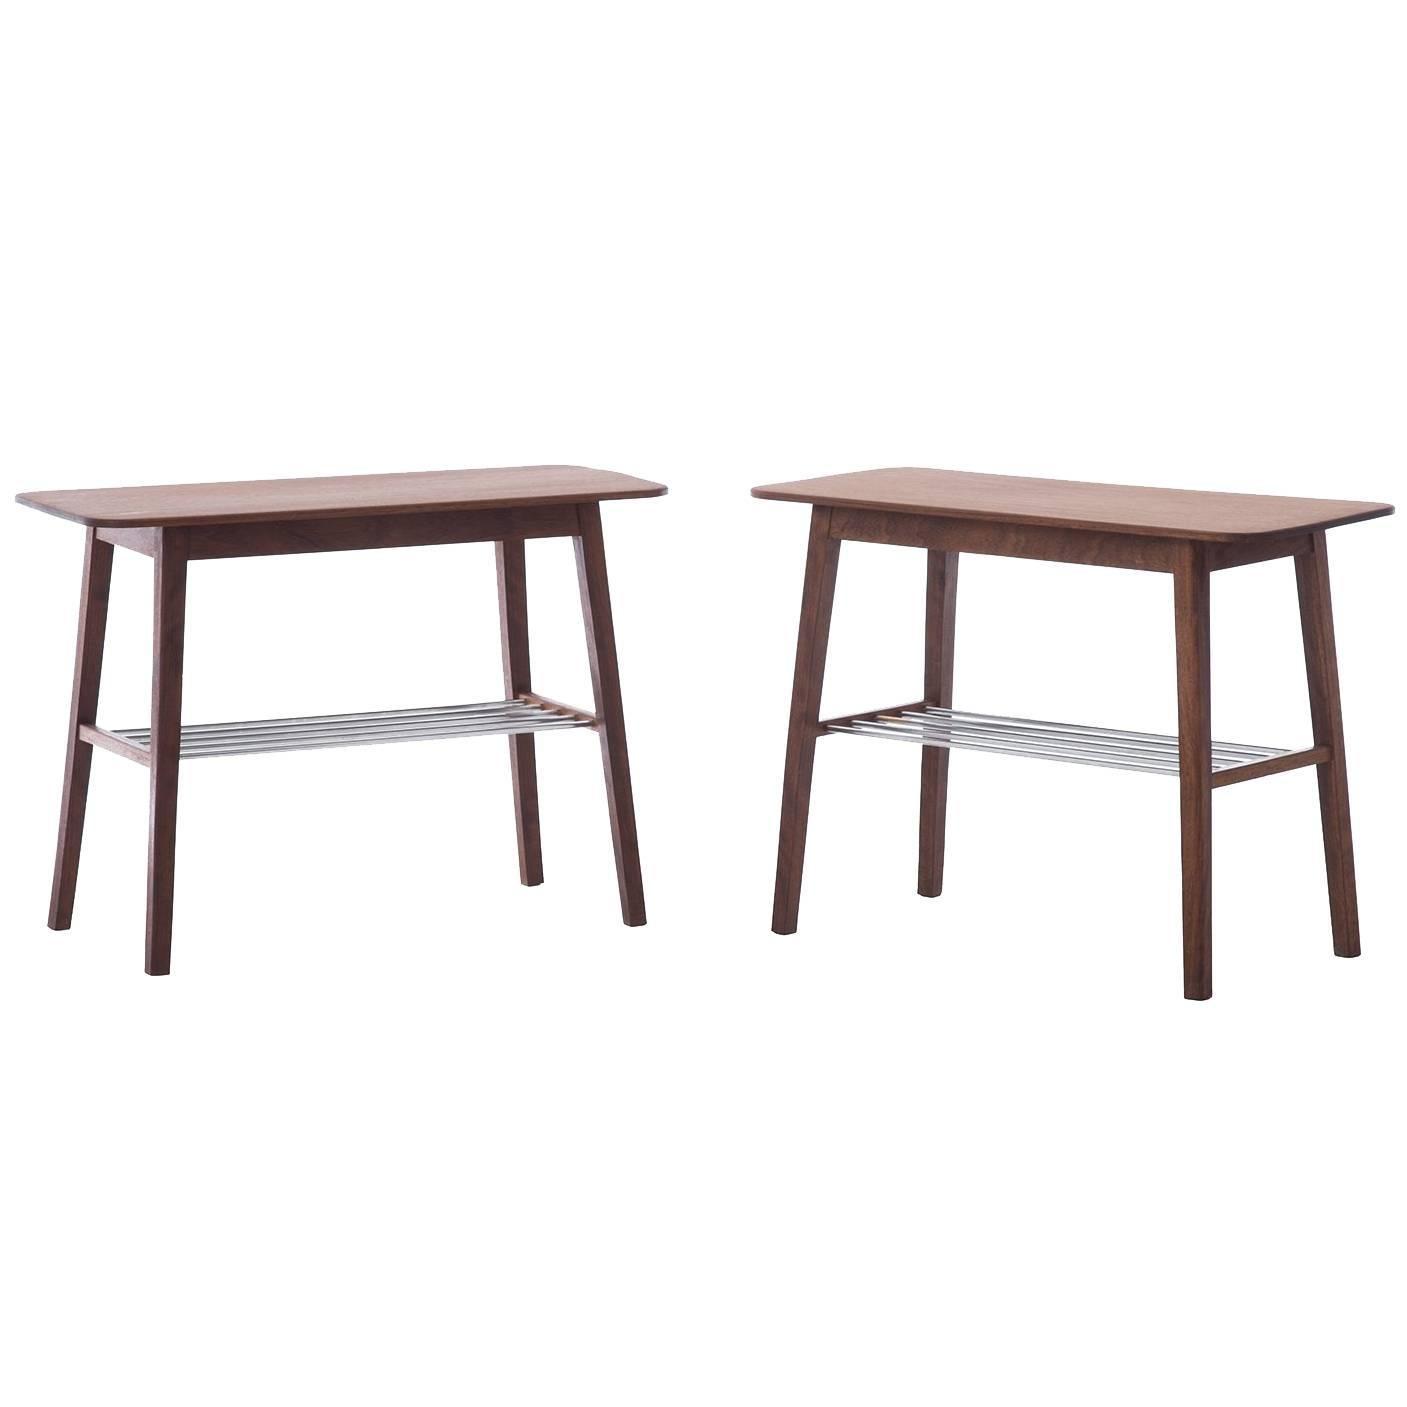 Danish Modern Side Tables with Metal Shelf